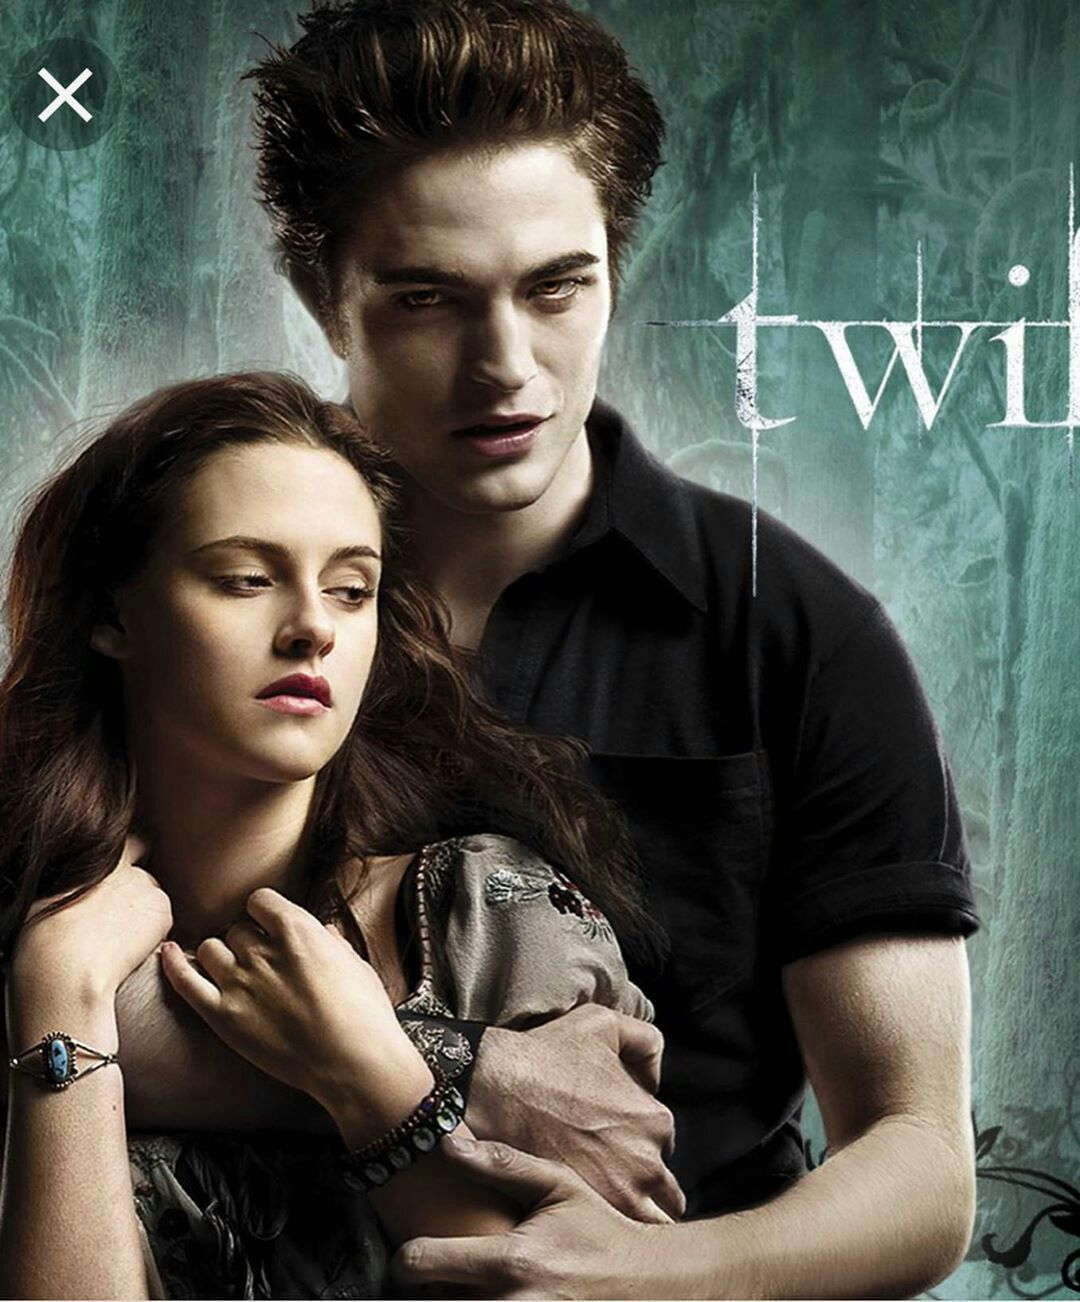 Pin De Varna Swan Em Twilight Movie Saga Crepusculo Hd 1080p Filmes